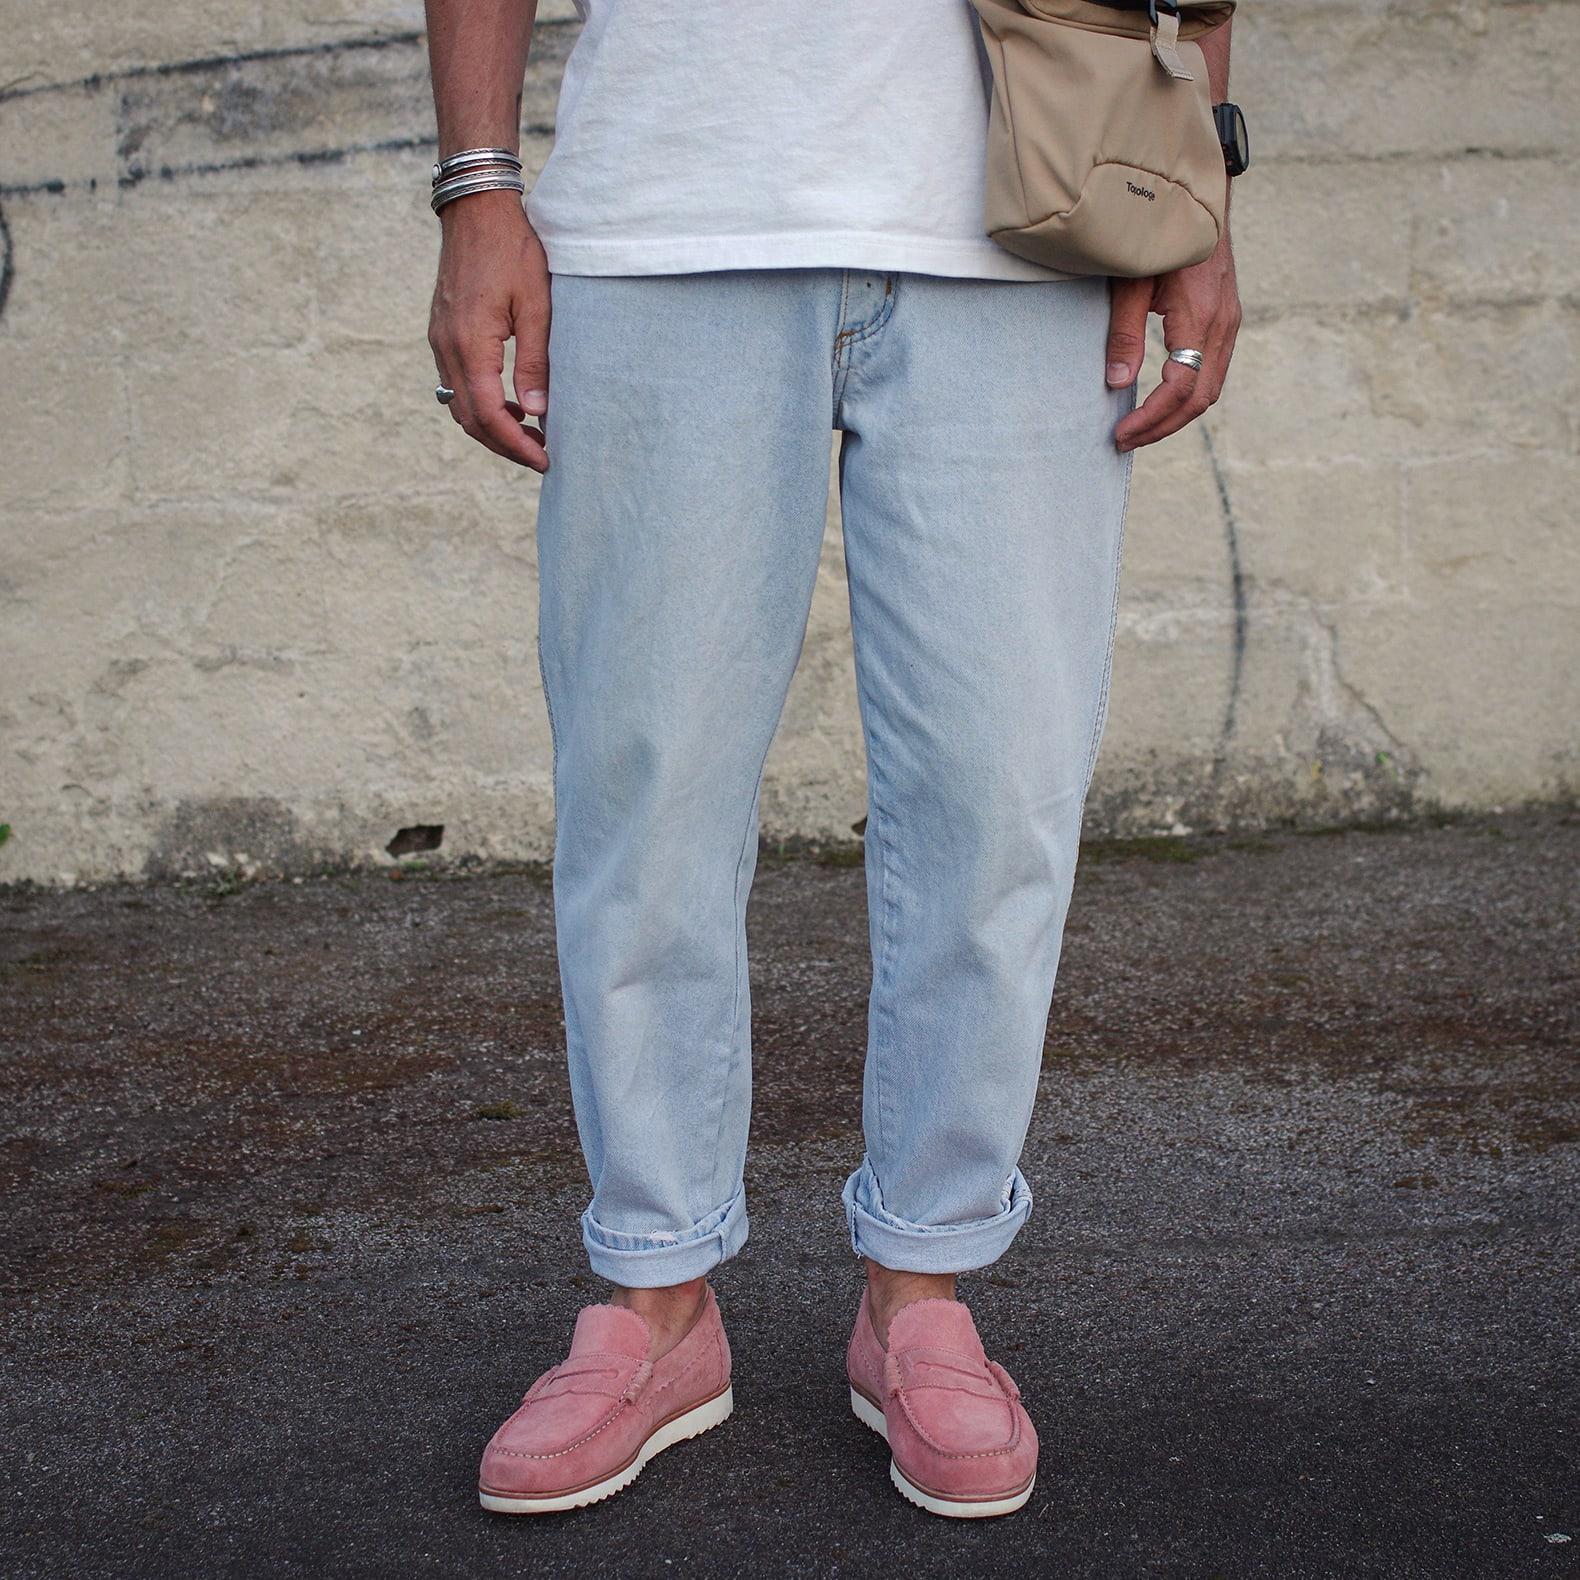 jean bleach wrangler mocassins penny loafers roses grenson